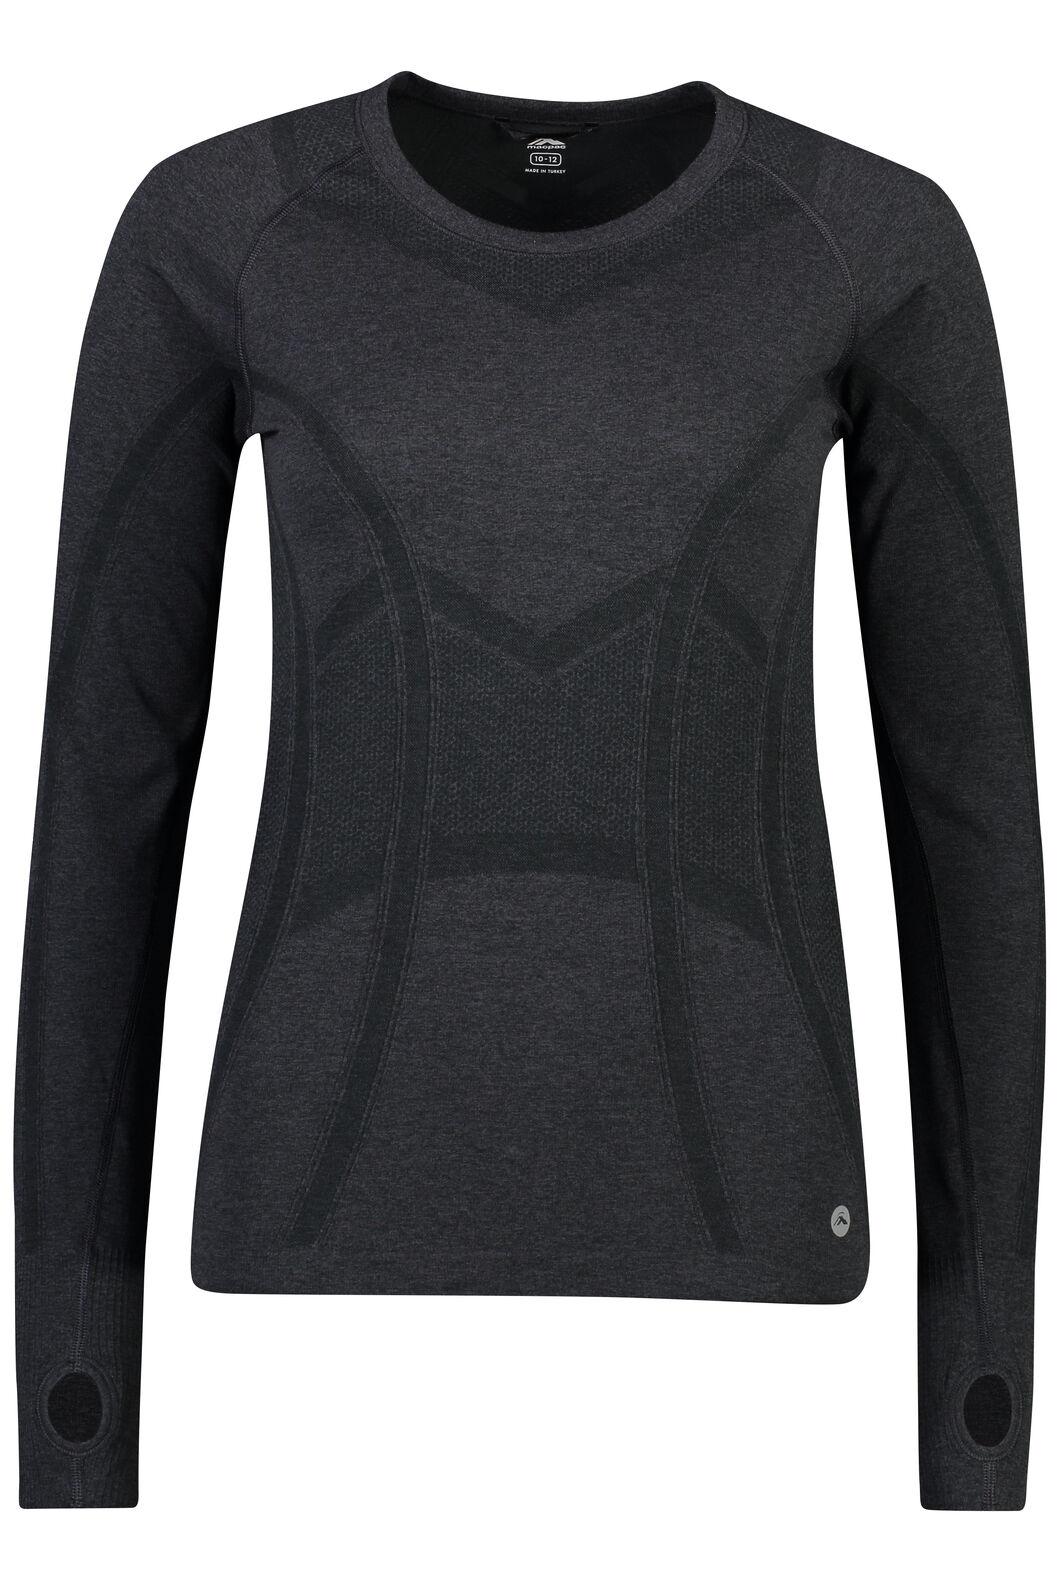 Macpac Limitless Long Sleeve Tee - Women's, Black, hi-res